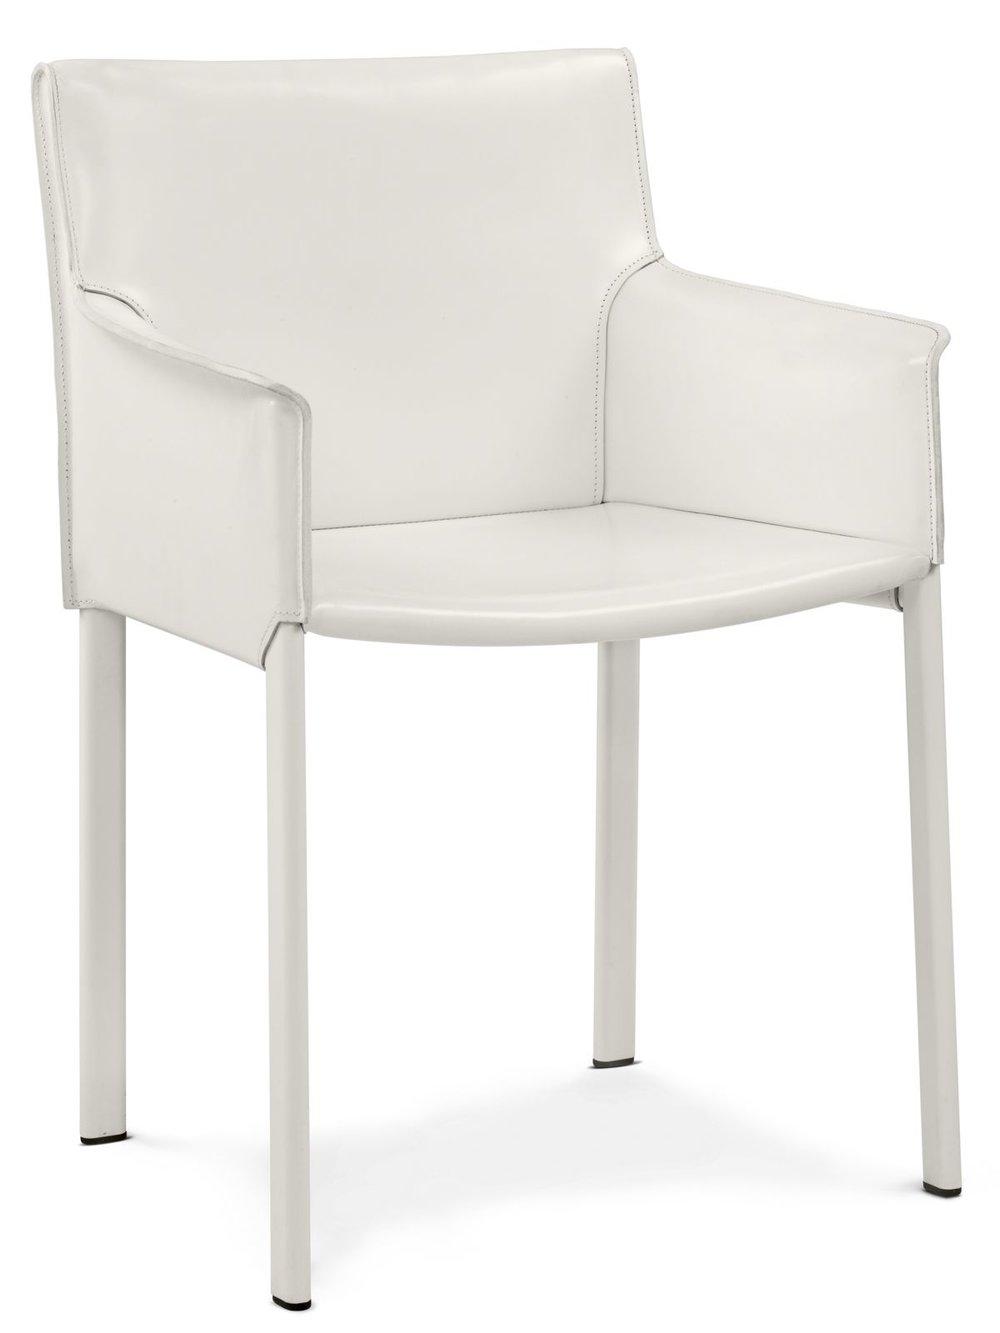 modern-office-armchairs-Italian-furniture-designer-armchairs (40).jpg